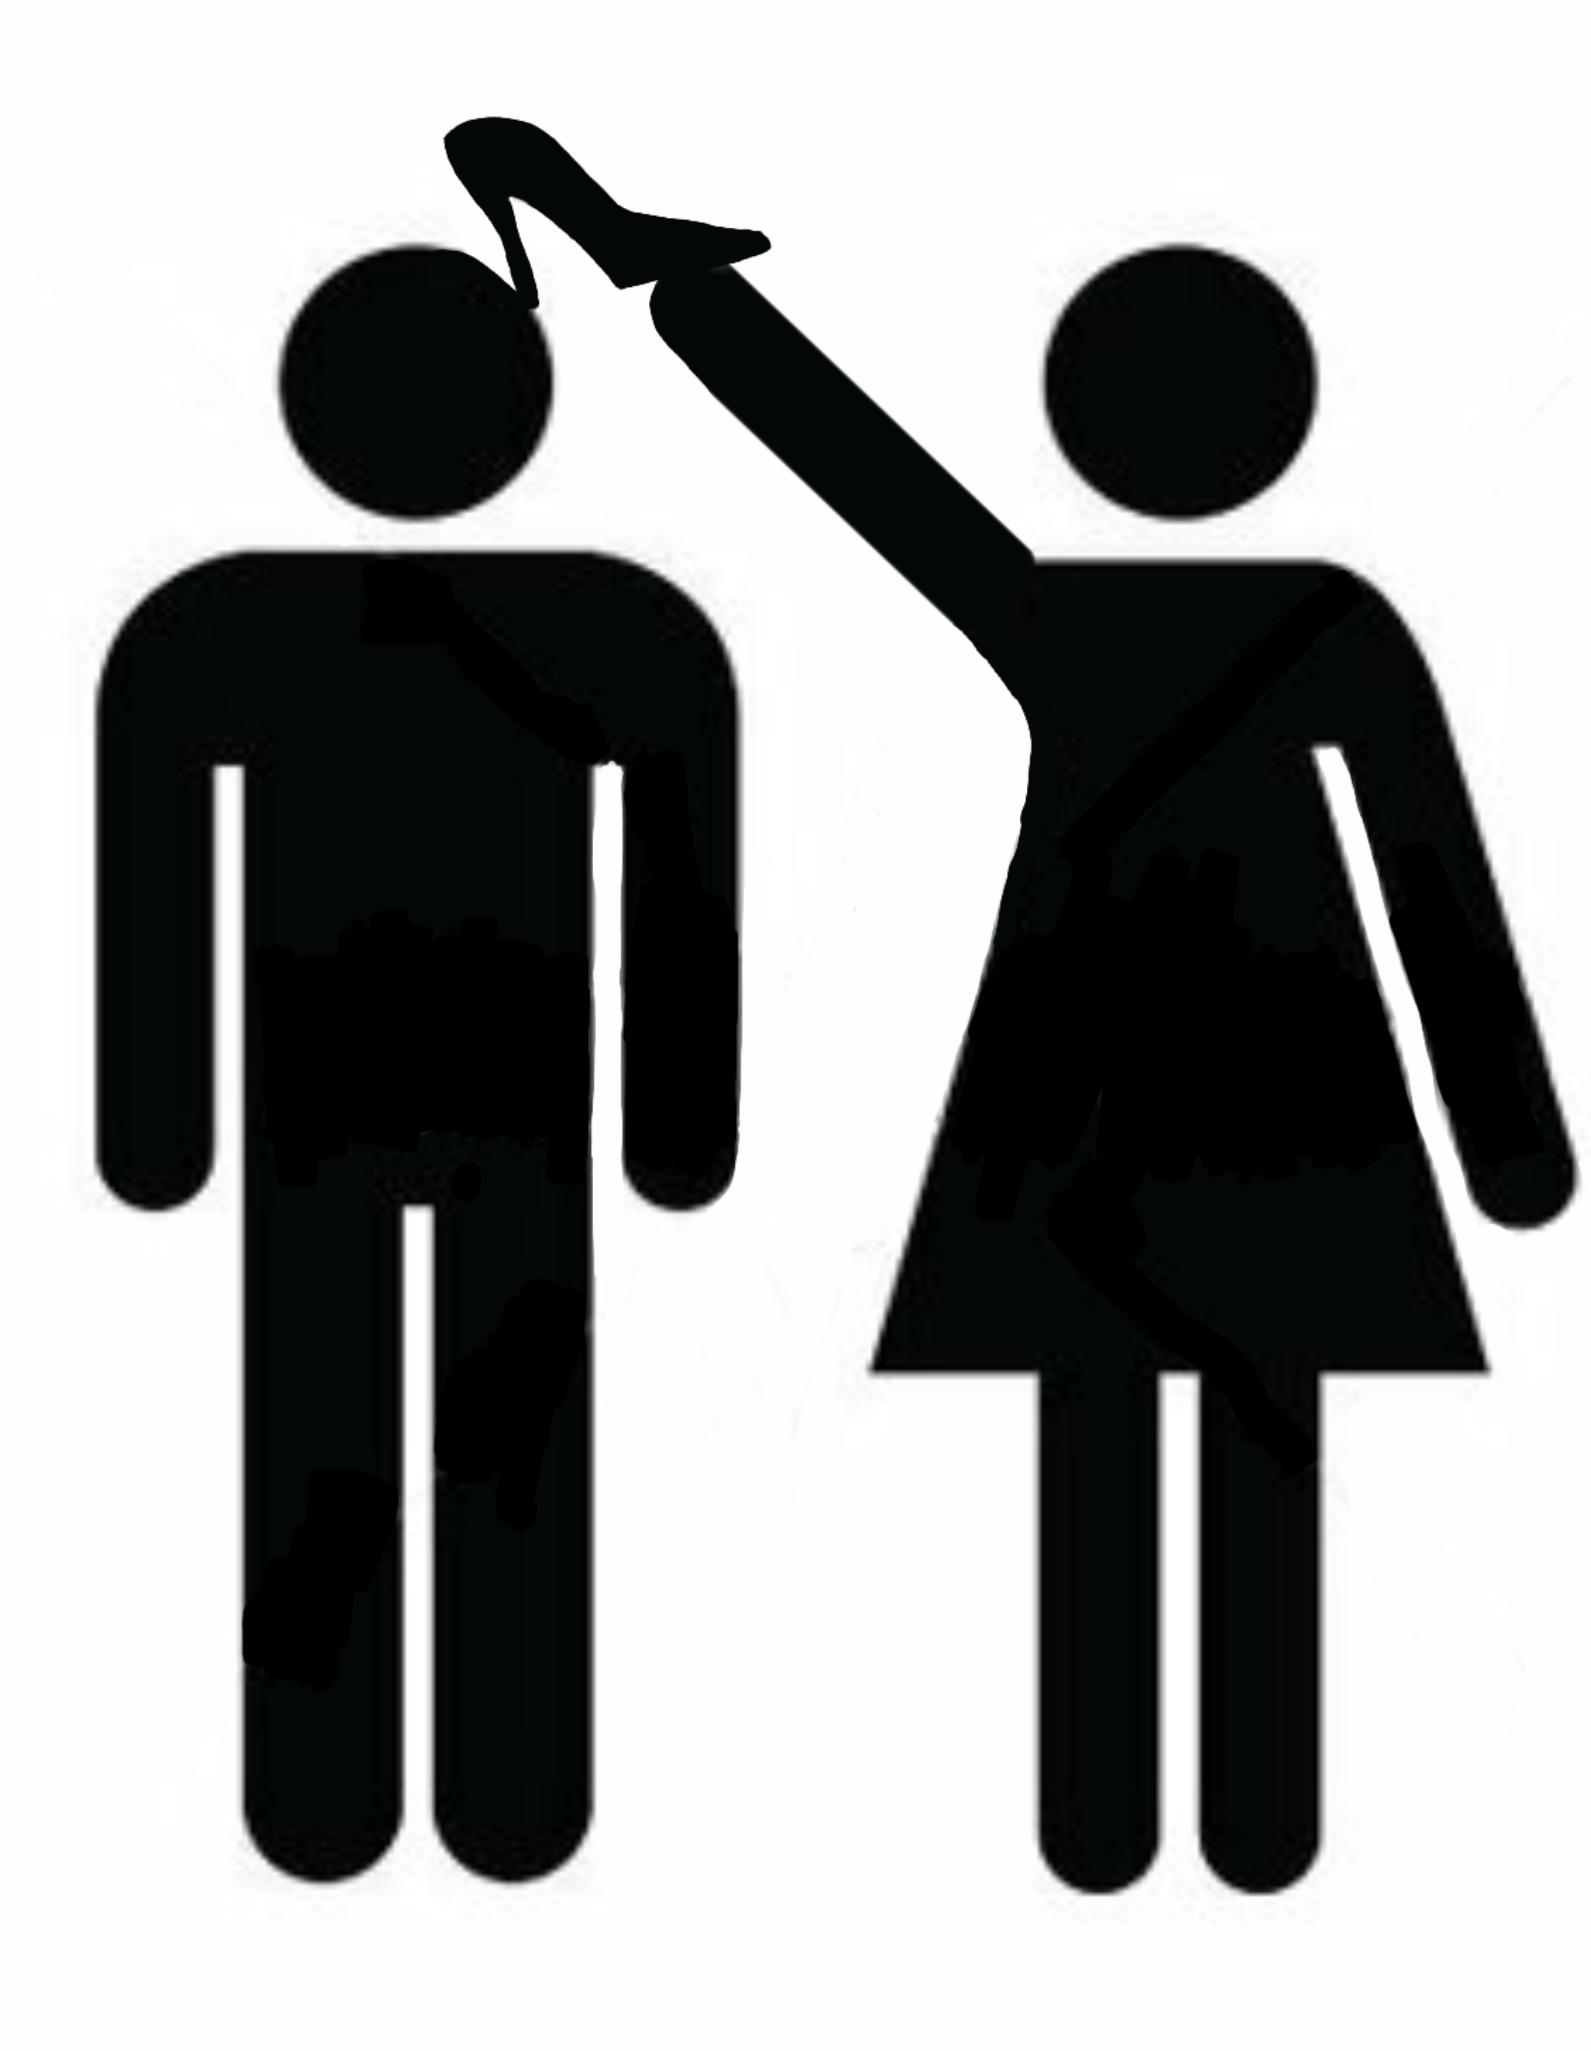 Rebranding Chauvinism as Misogyny Criminalises All Men.